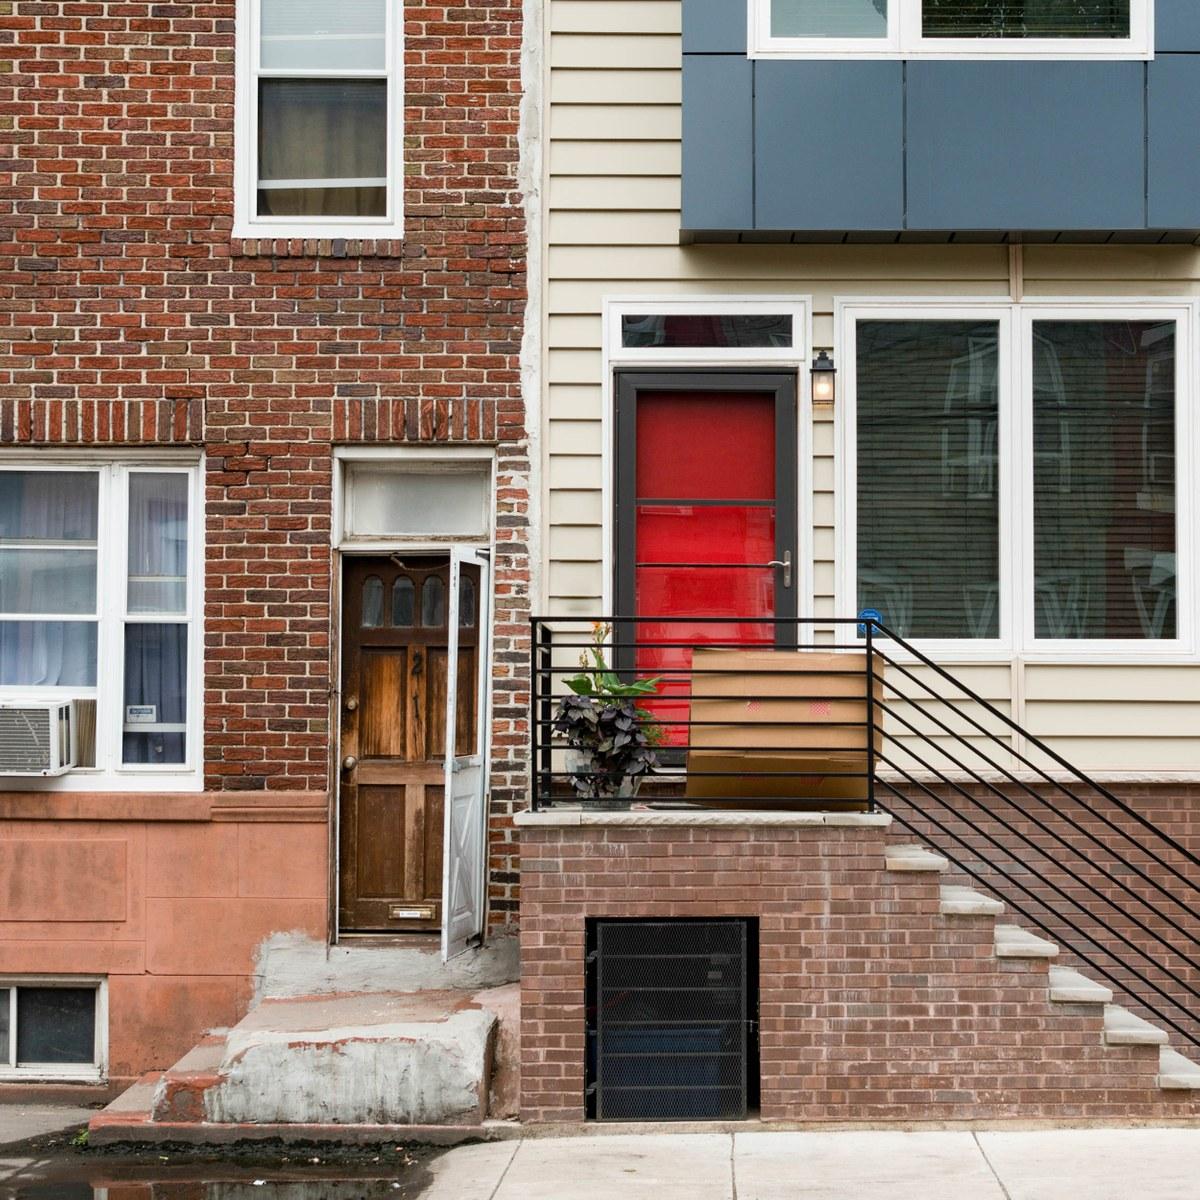 Point Breeze, Philadelphia PA - Neighborhood Guide